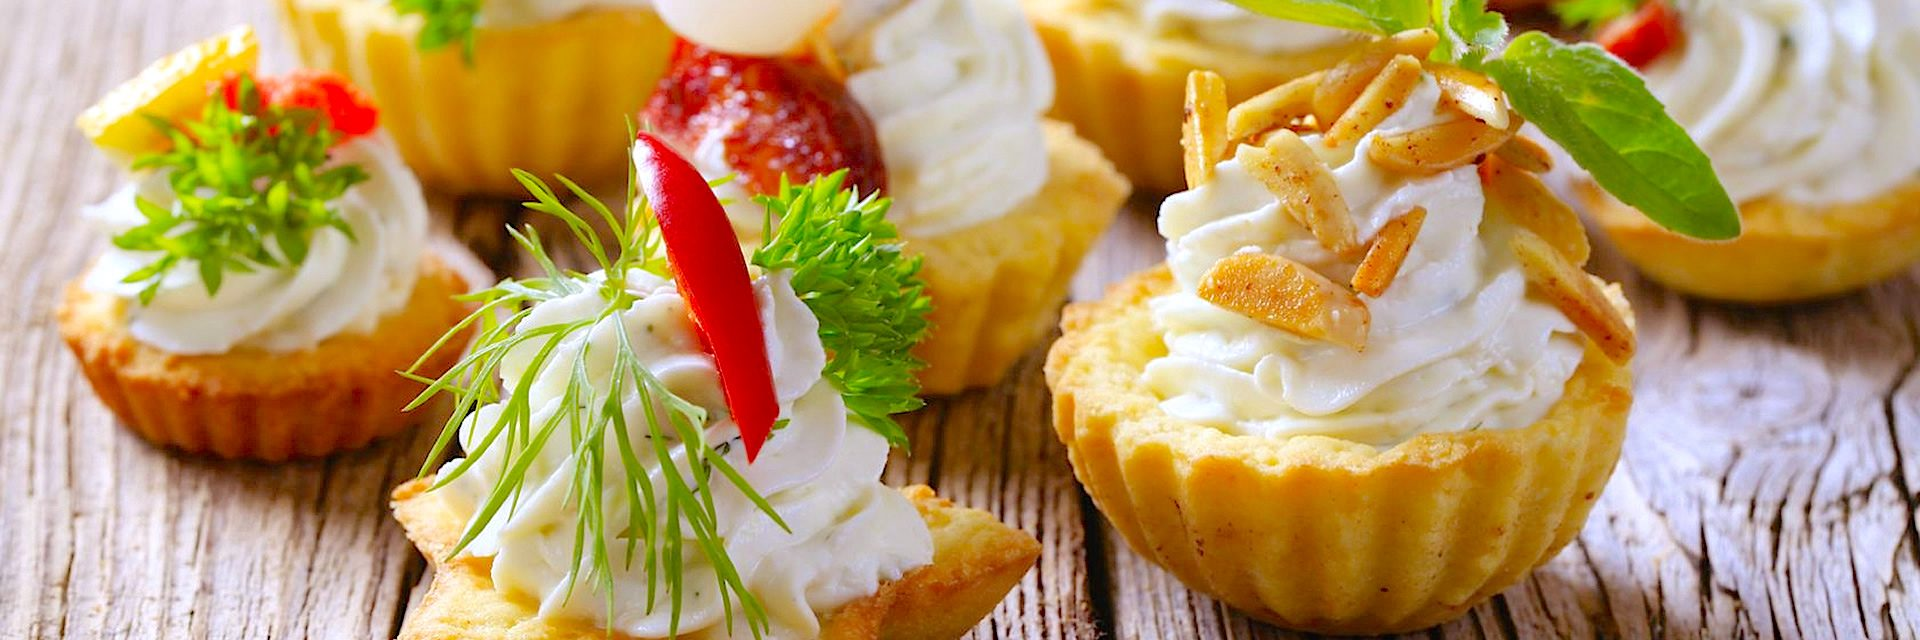 Aperitivo e Finger Foods